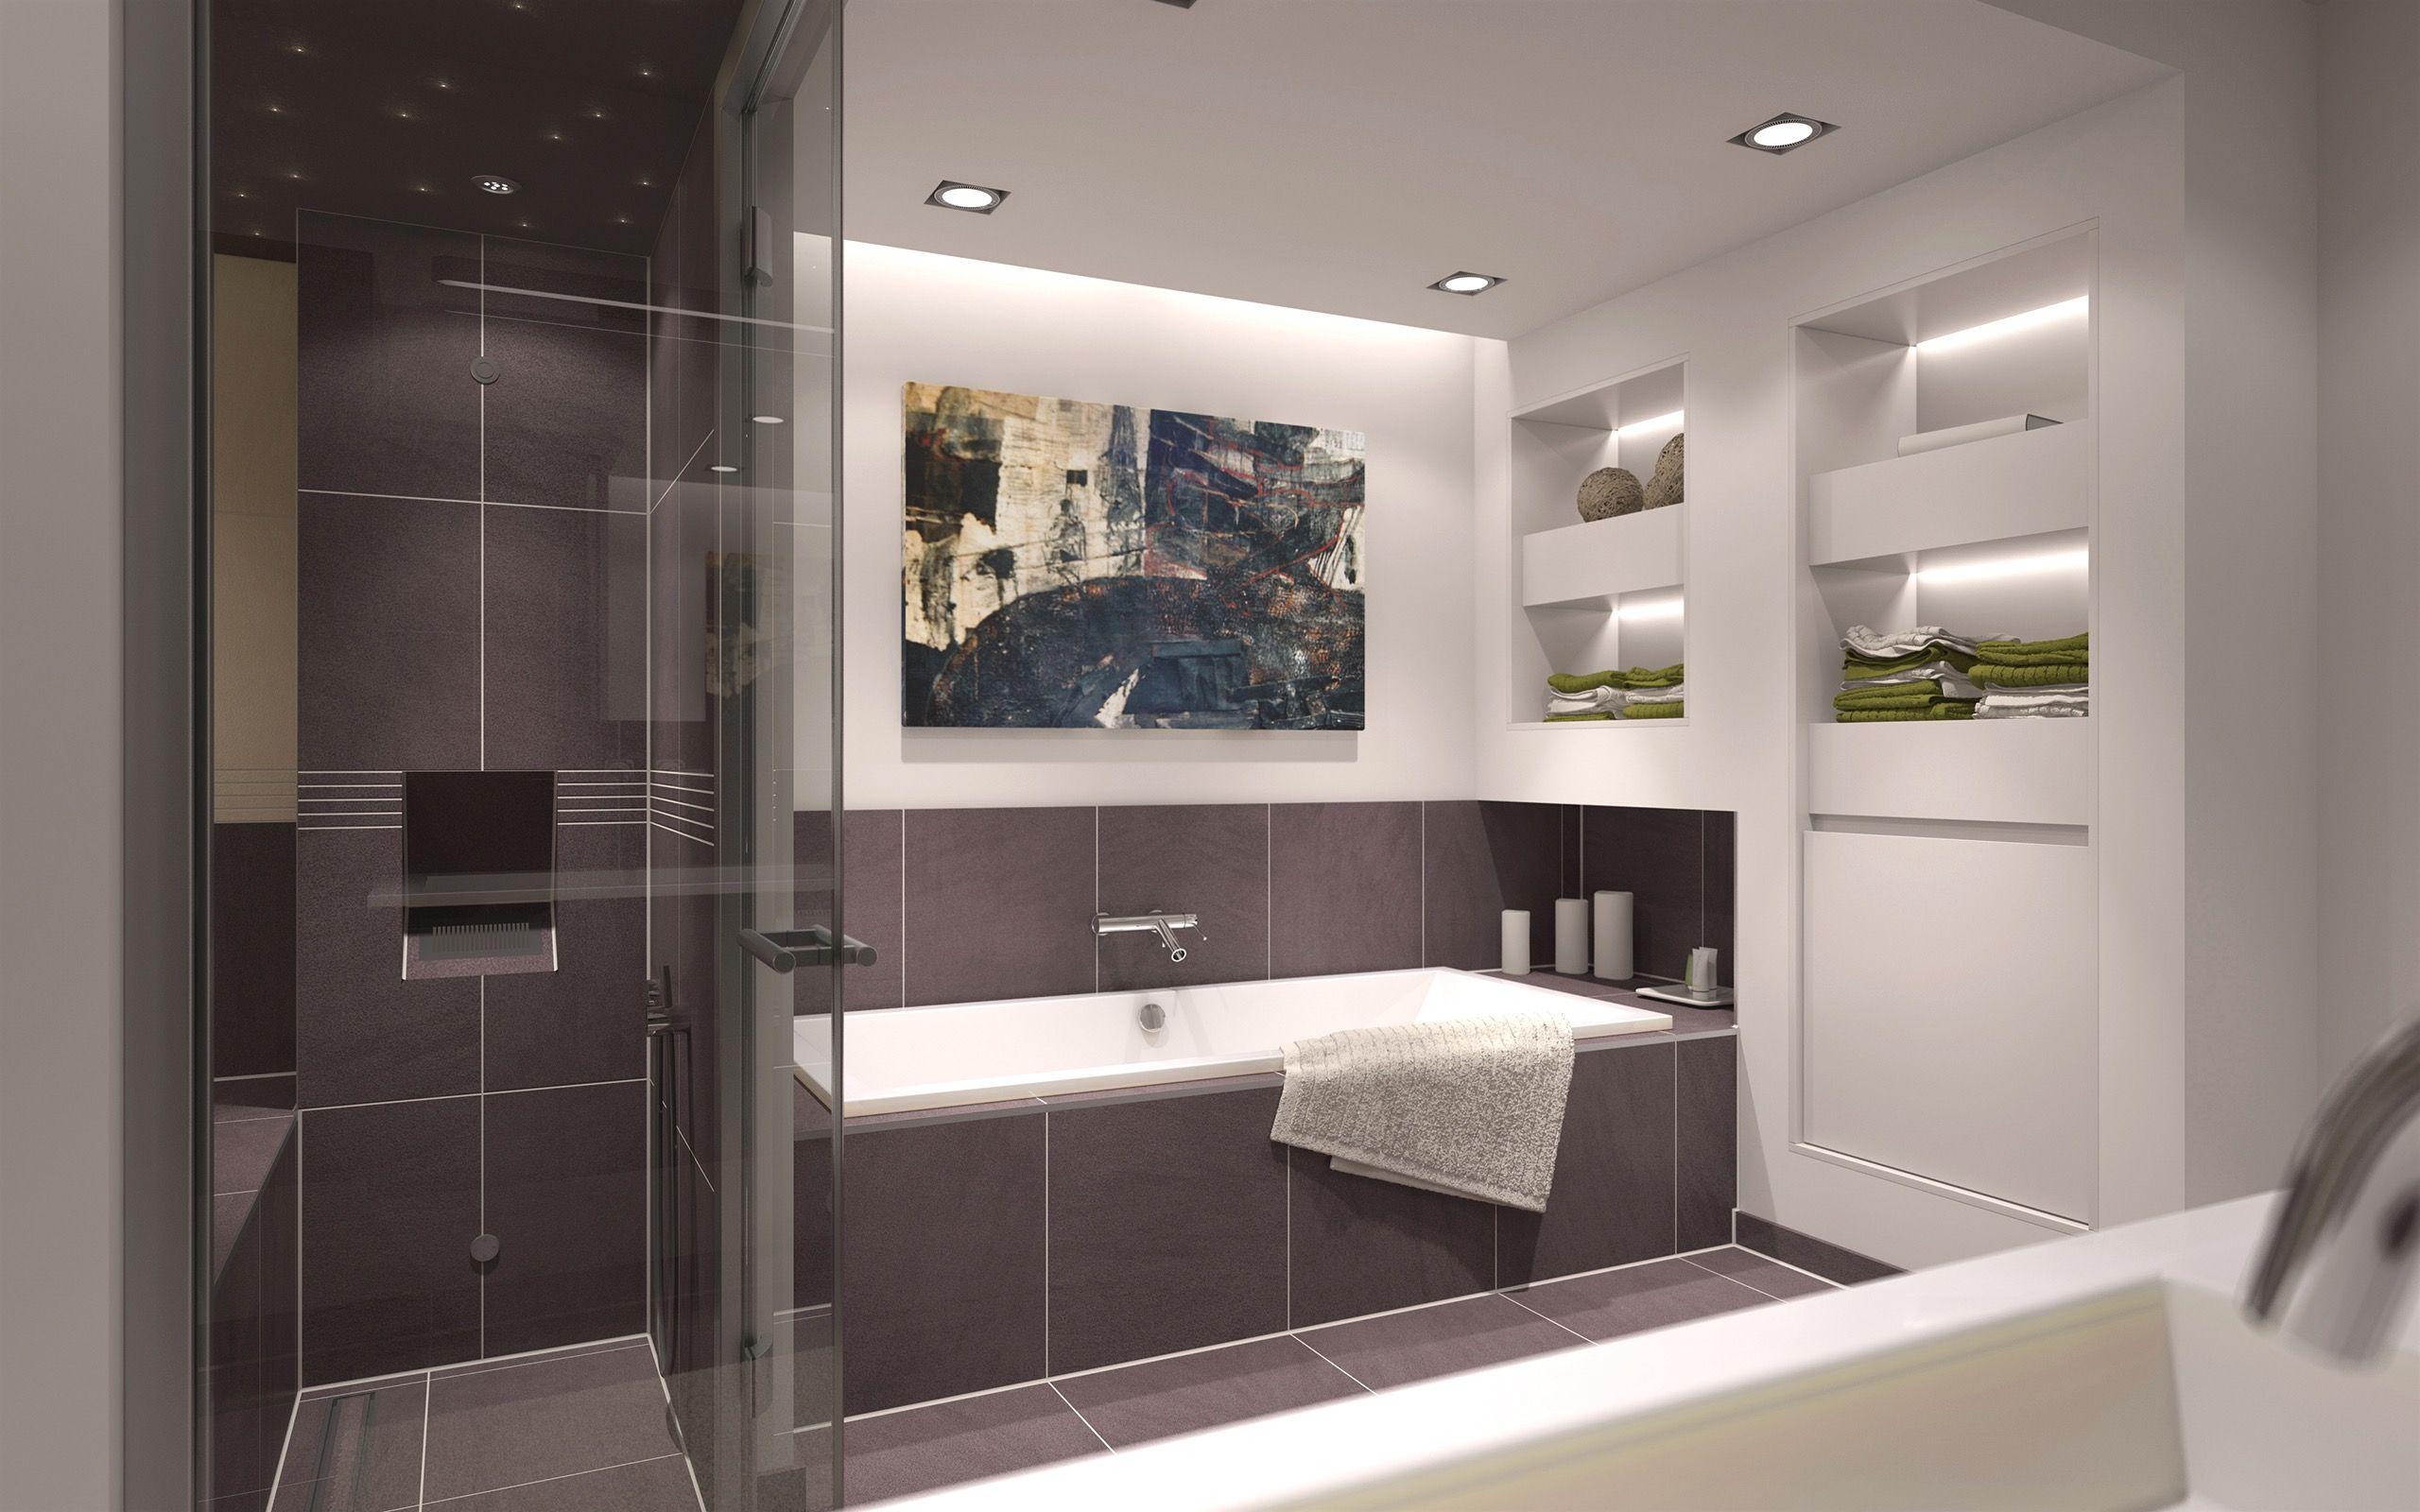 Badezimmer 8 Quadratmeter  Badezimmer beispiele, Badezimmer